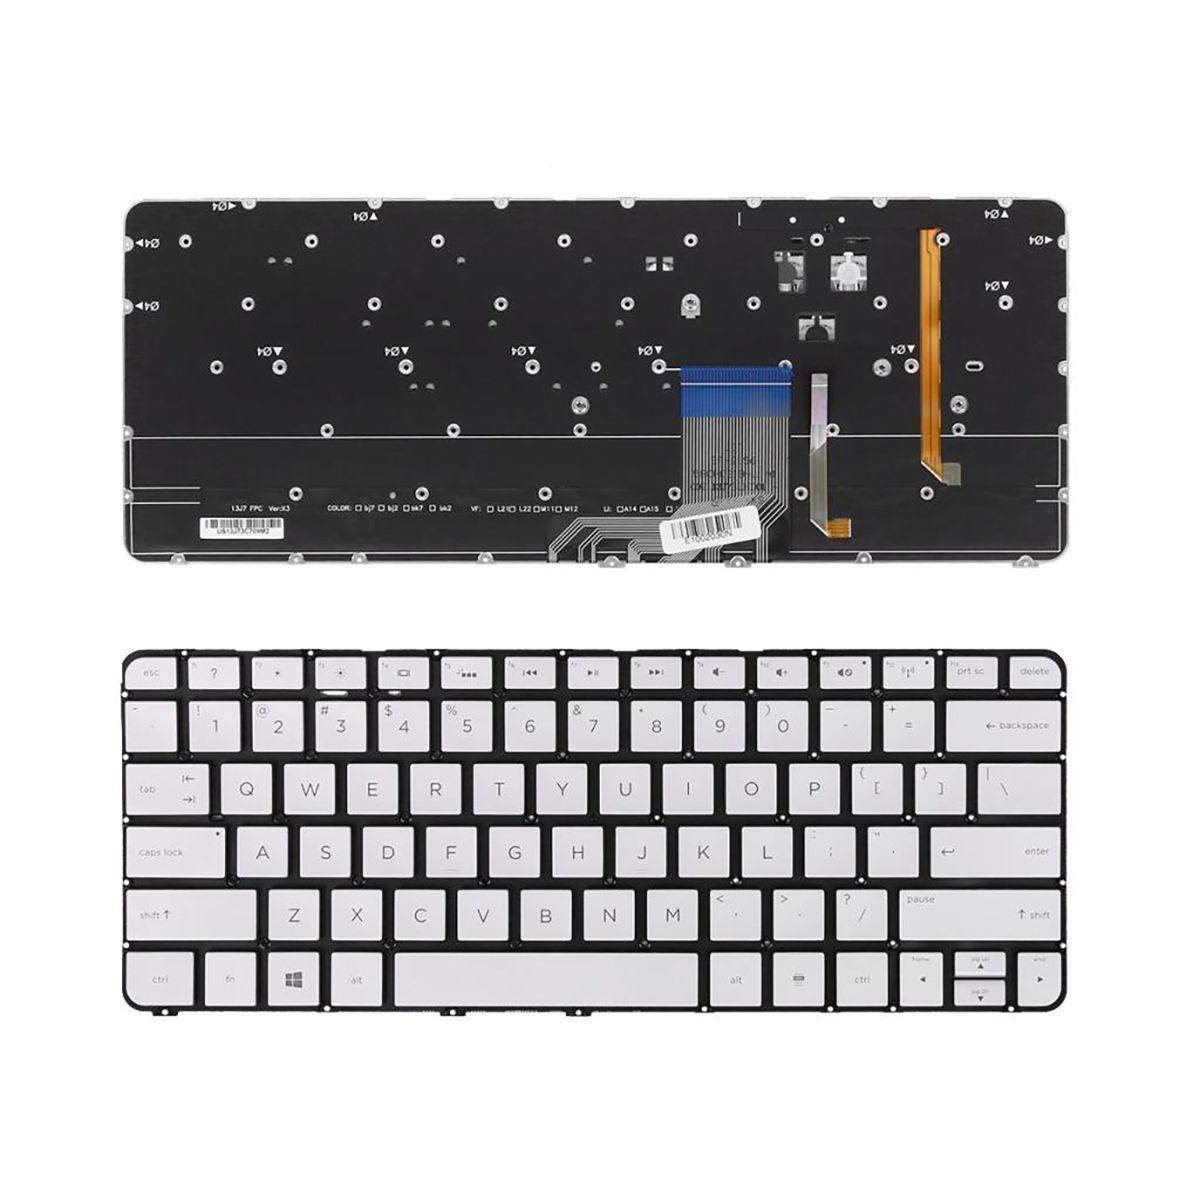 NEW Laptop Keyboard For HP Spectre 13-3000 13T-3000 series Backlit US Layout Repair Keyboard